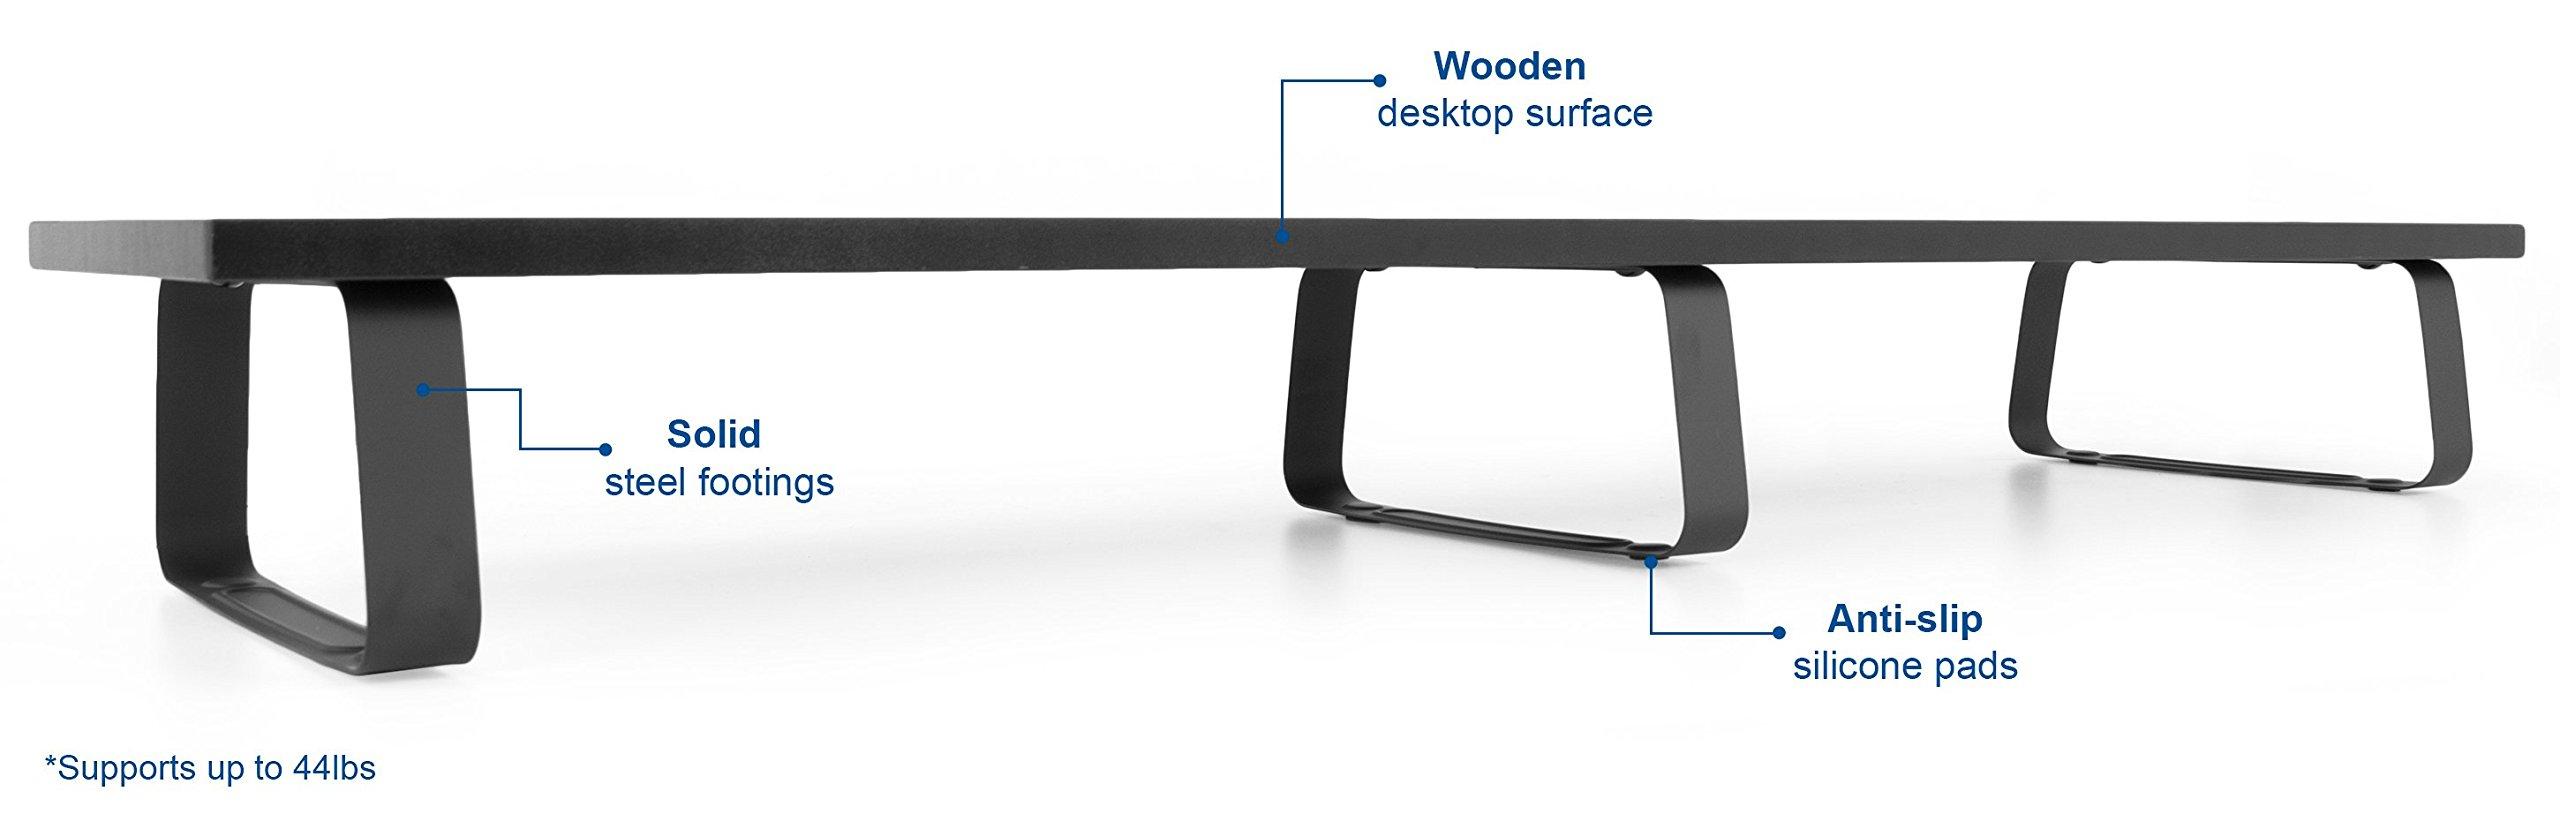 VIVO Black Wood 39'' Wide Extra Long Desktop Stand Ergonomic TV, Dual Monitor Riser and Desk Tabletop Organizer (STAND-V000DL) by VIVO (Image #7)